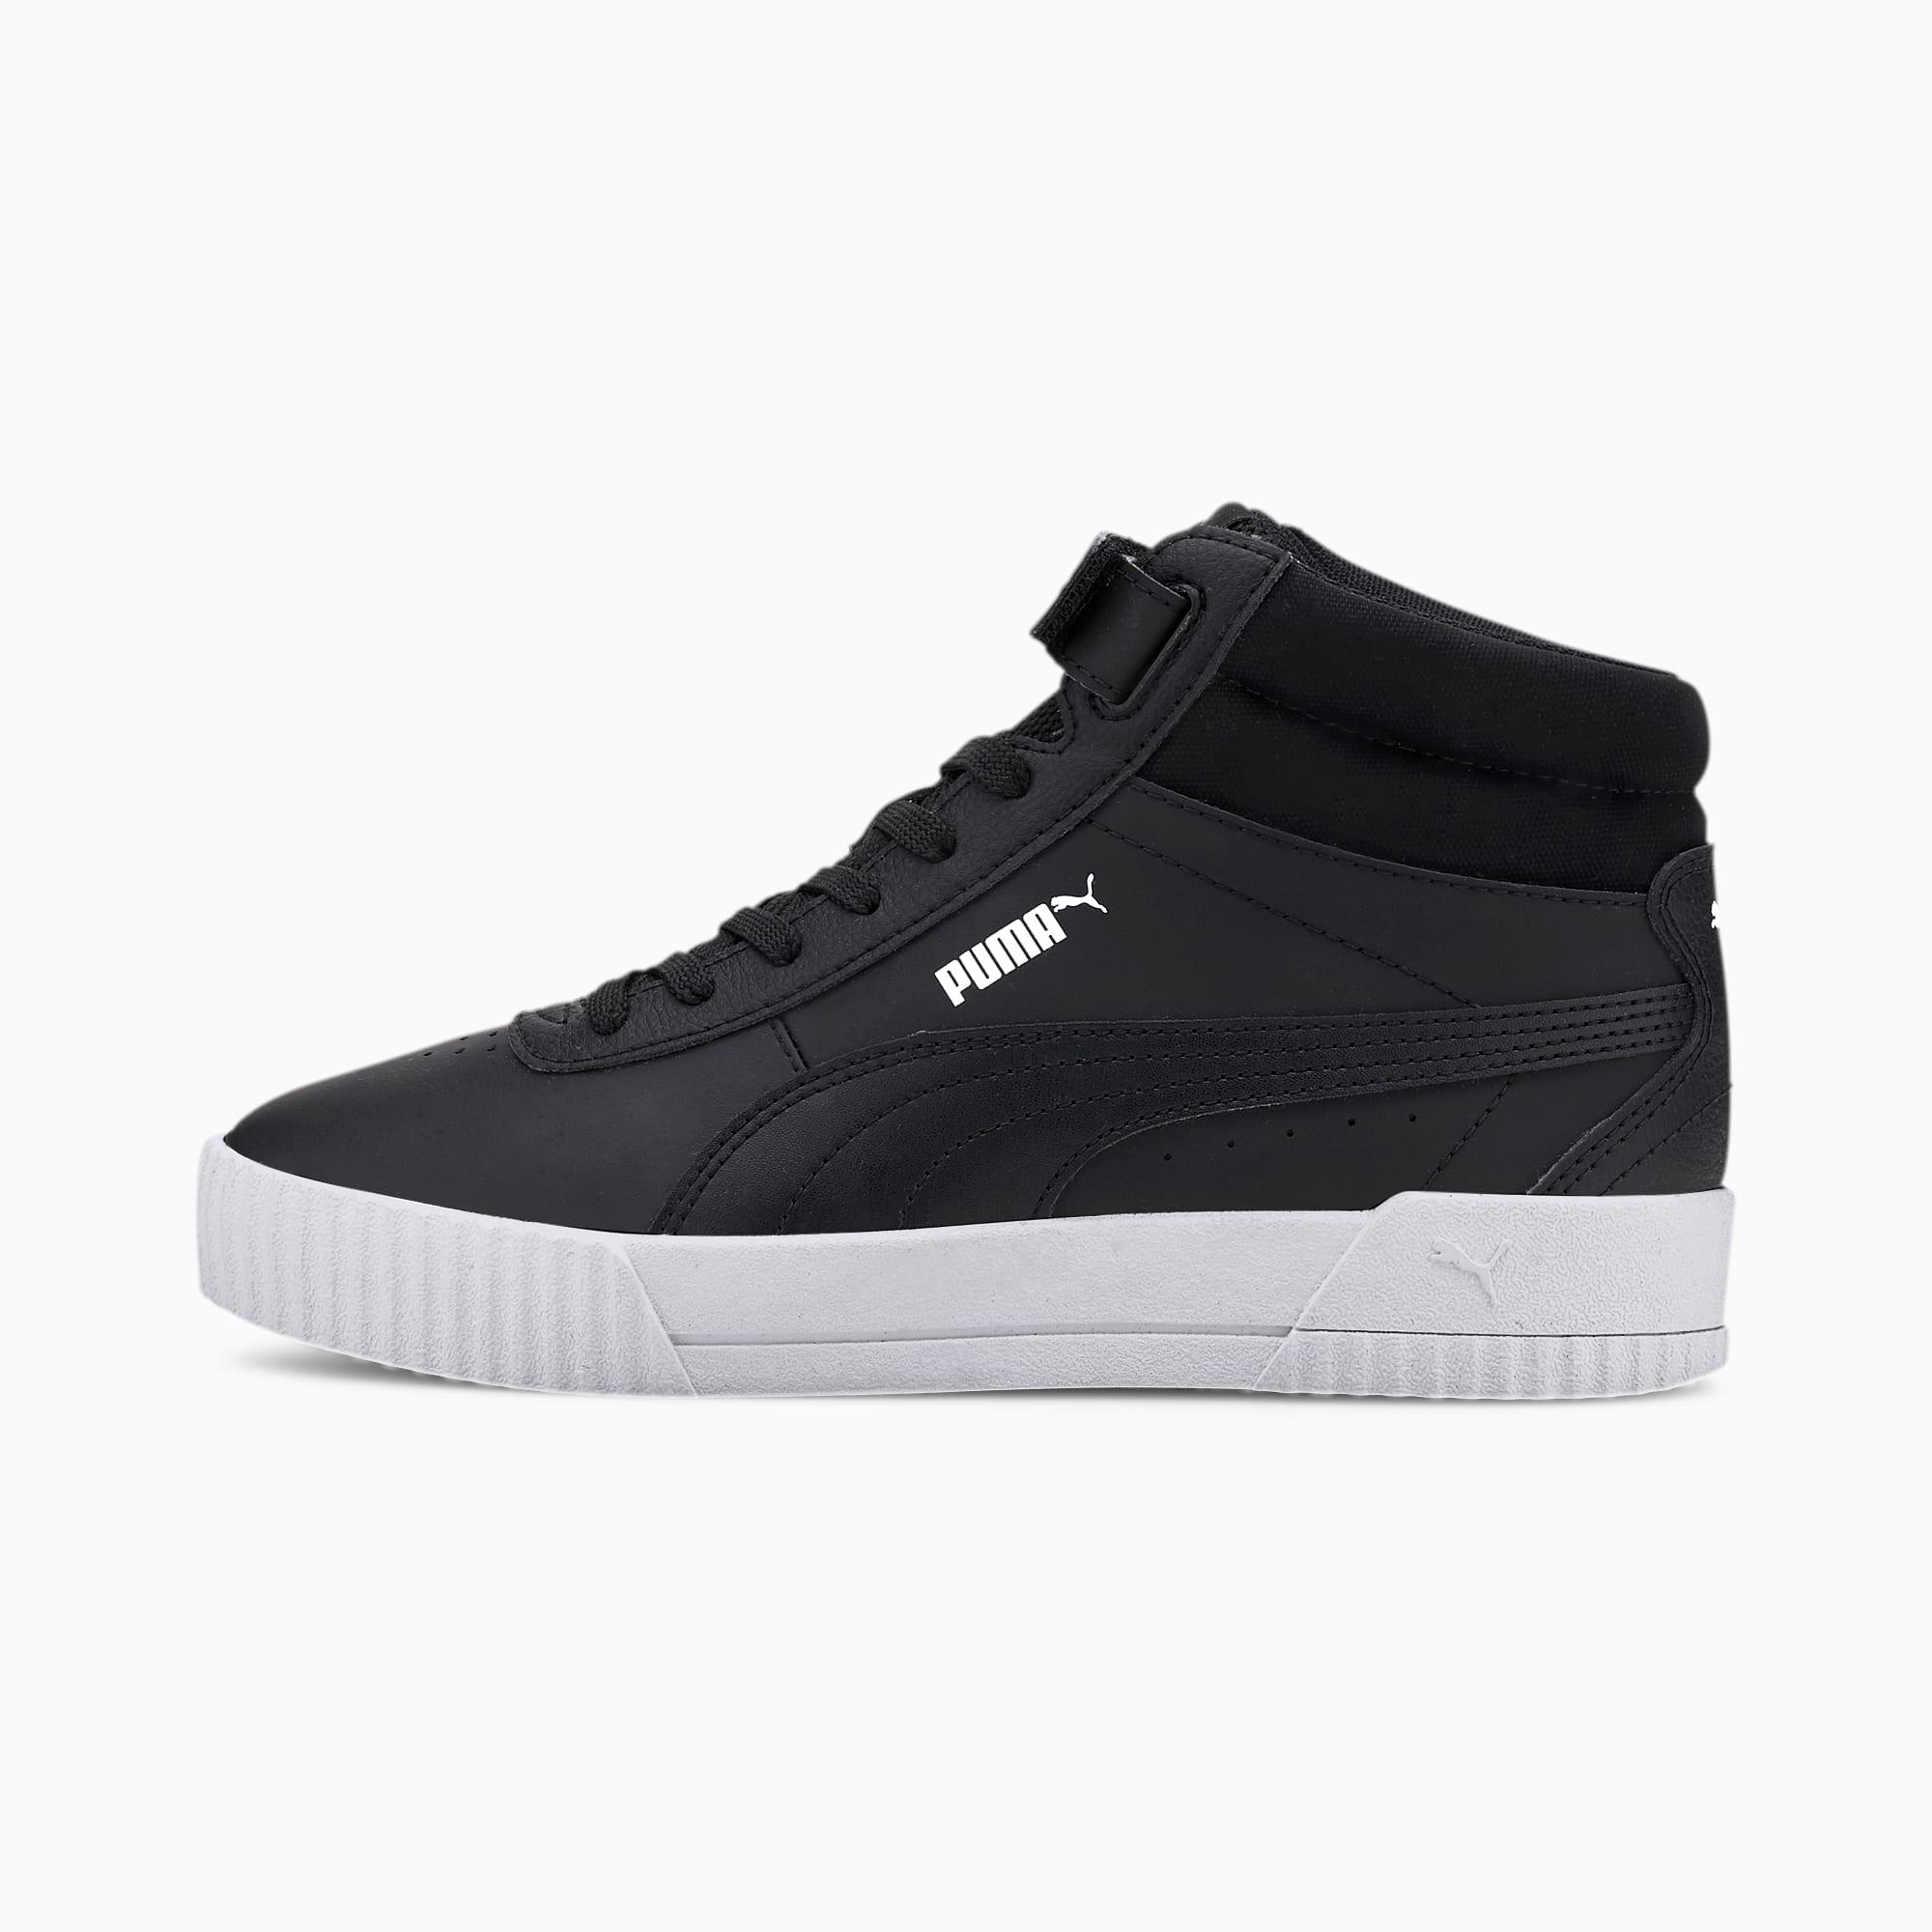 PUMA Chaussure Basket montante Carina femme, Noir, Taille 42, Chaussures